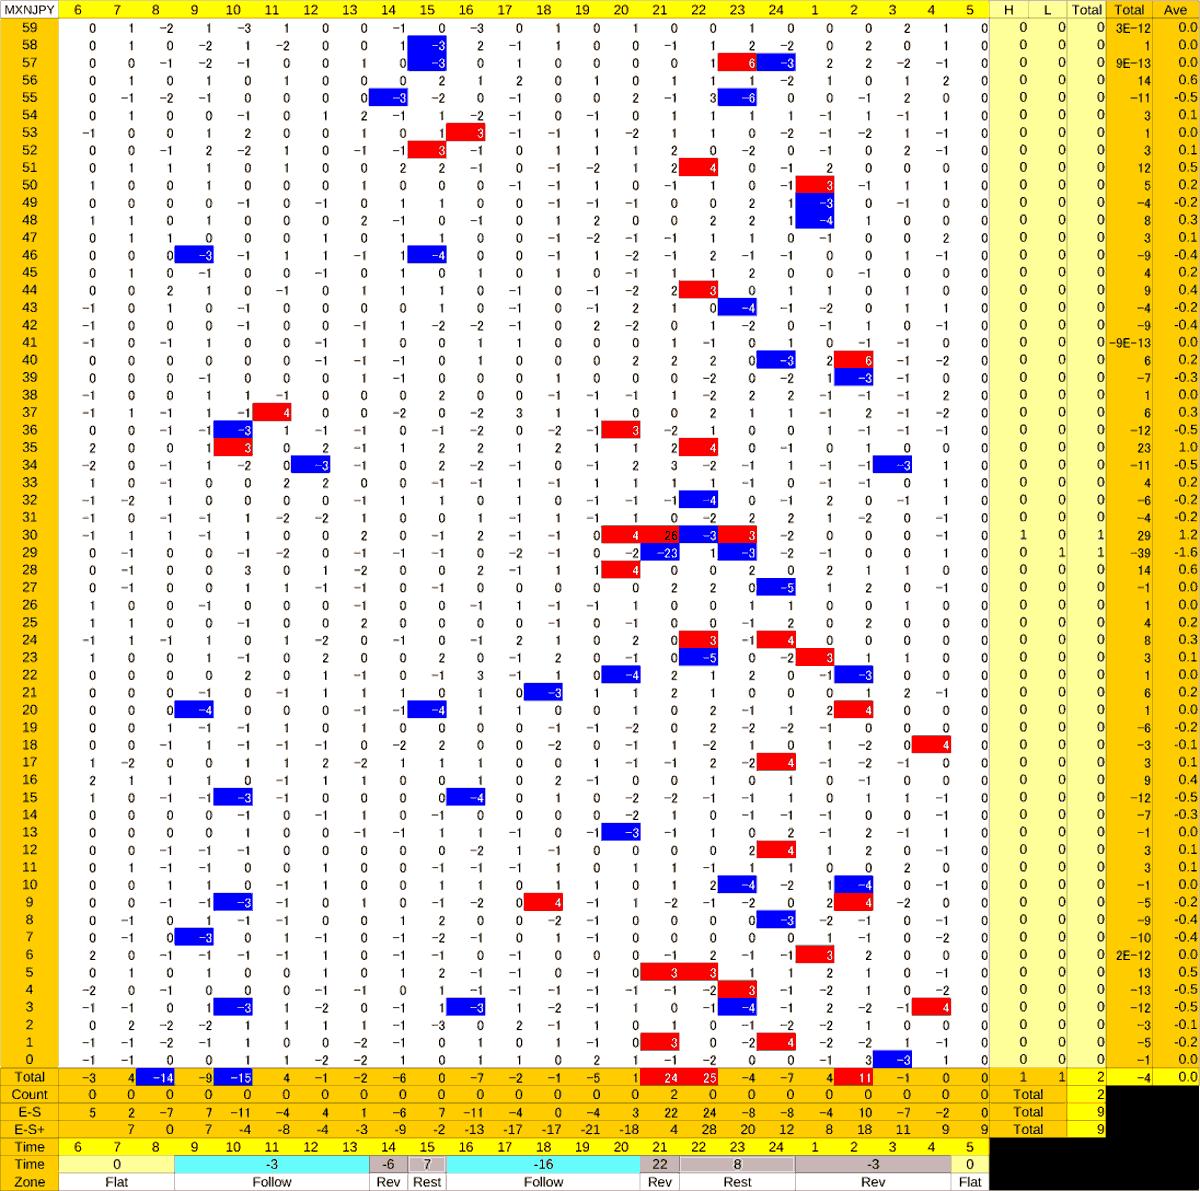 20200731_HS(3)MXNJPY